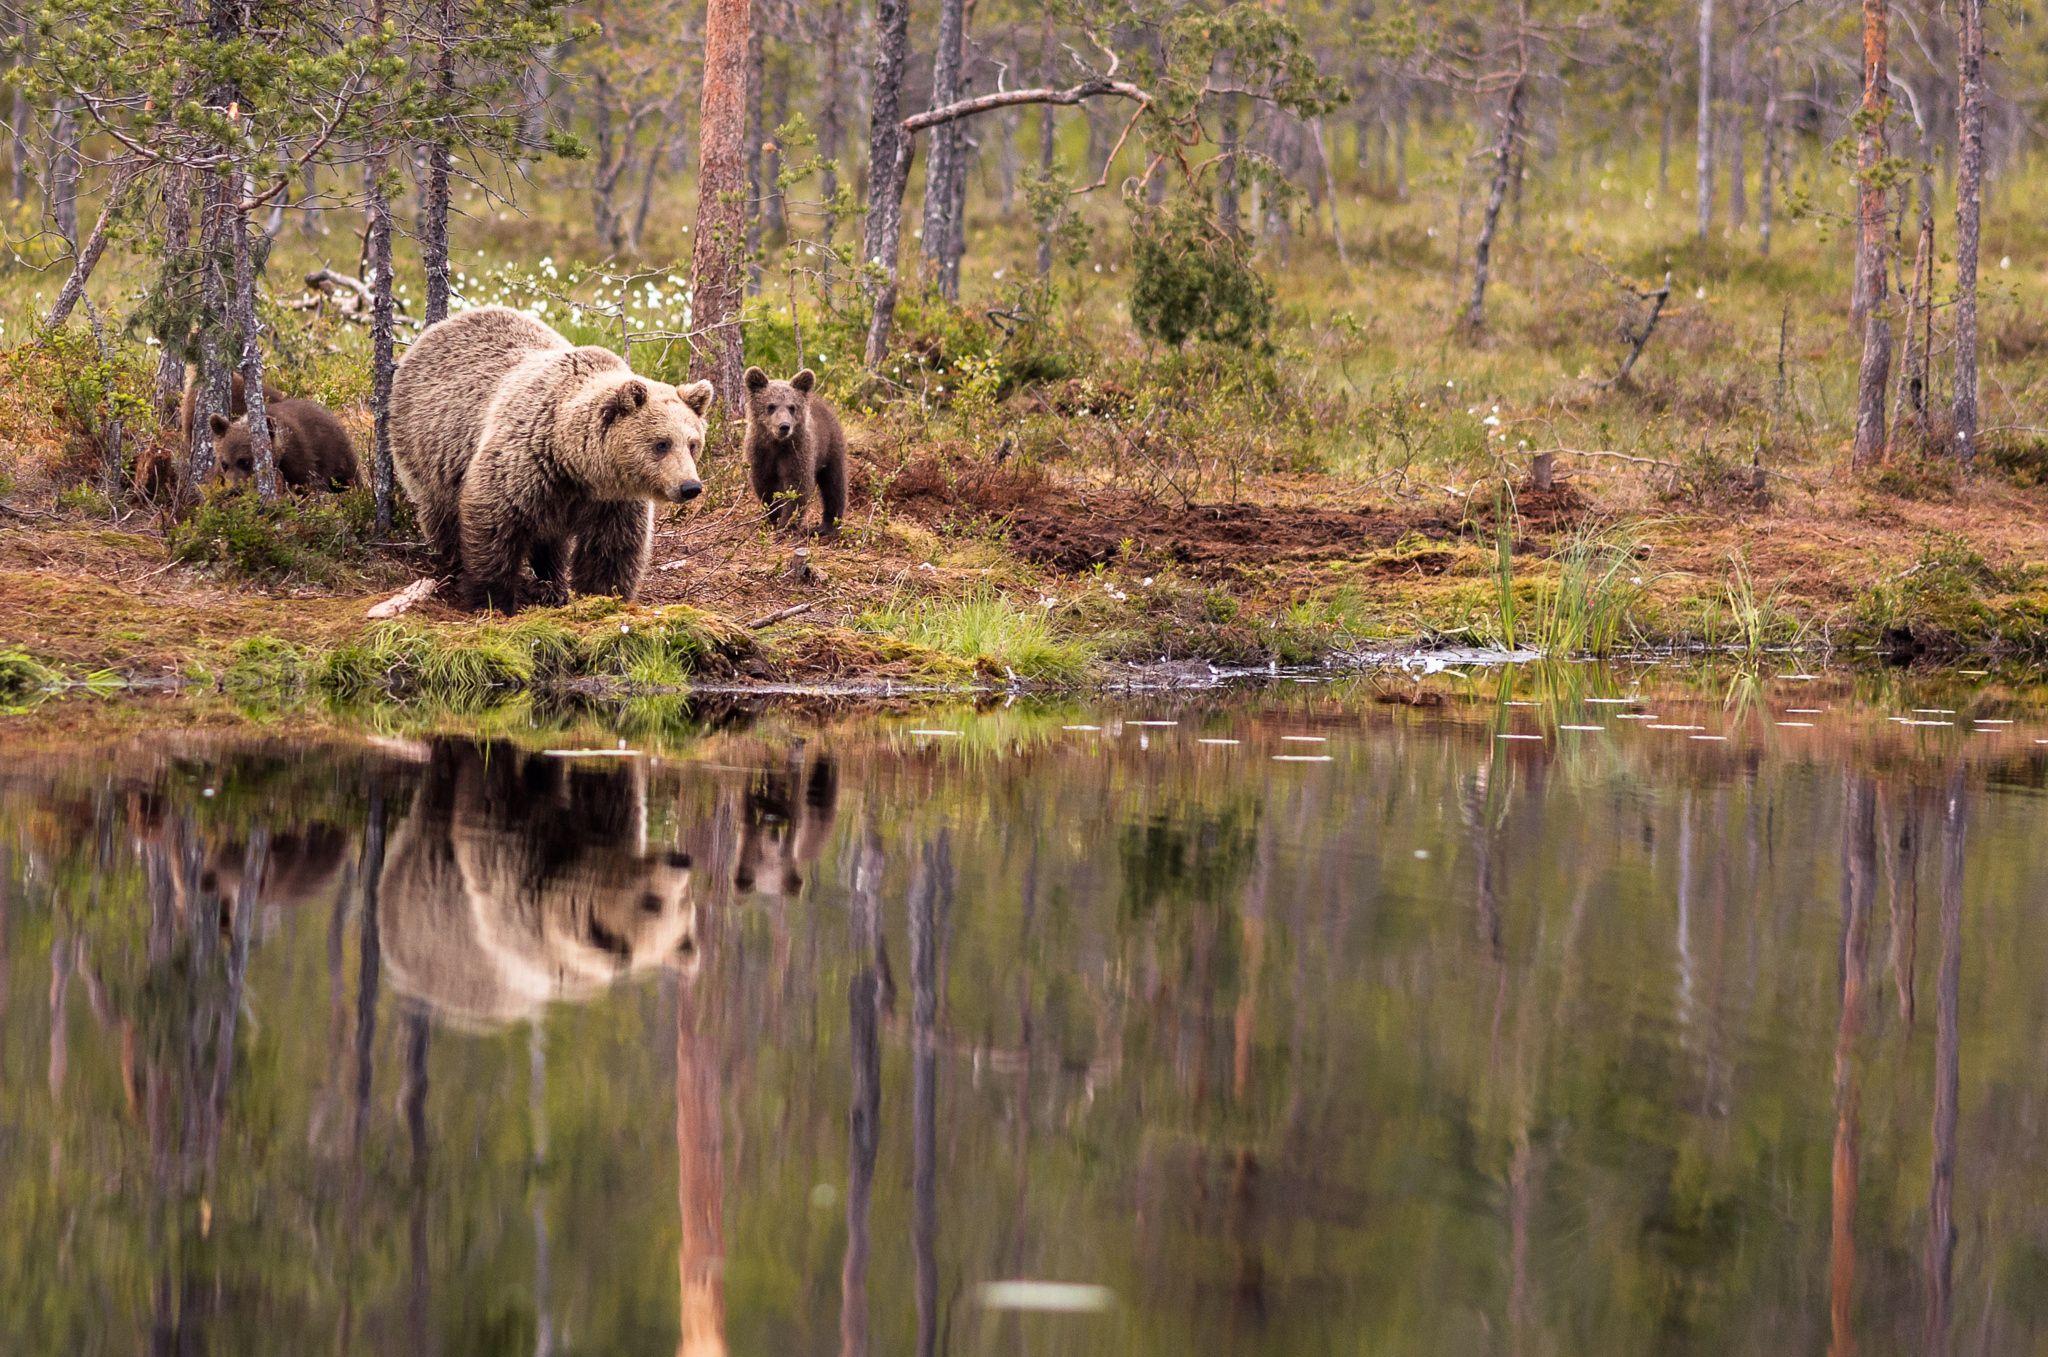 Familia de osos cerca del lago. Martinselkonen - Finlandia Oriental (by Jomppa)